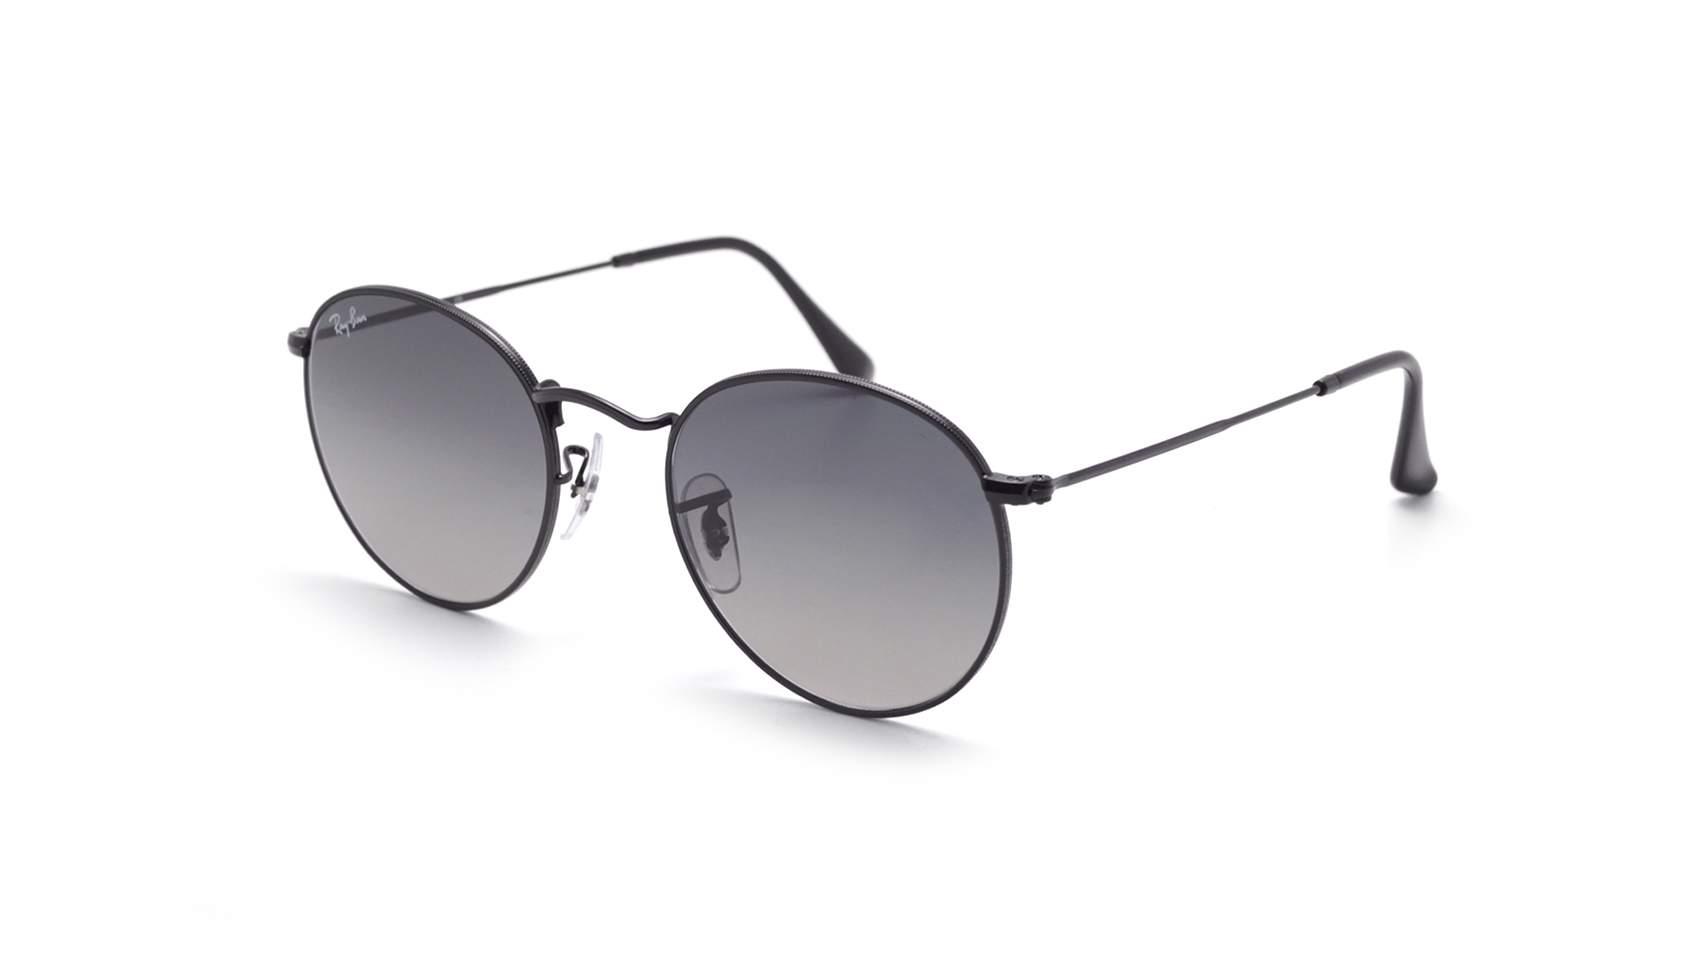 1429930ebb Sunglasses Ray-Ban Round metal Flat Lenses Black RB3447N 002 71 53-21 Large